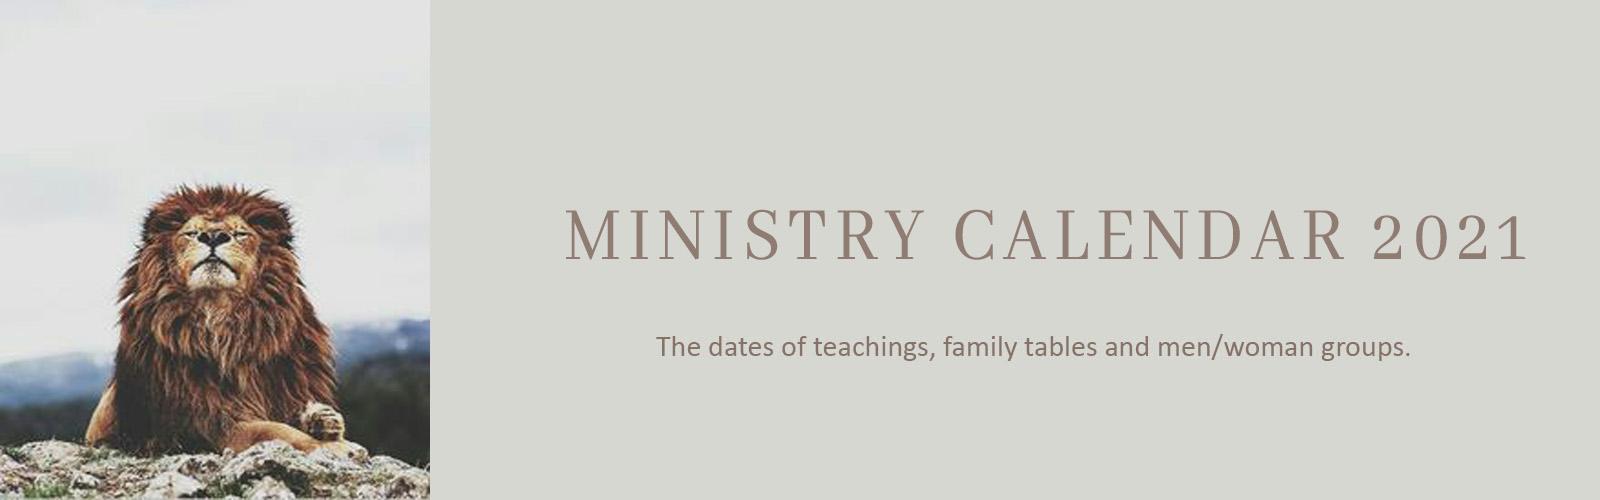 Ministry Calendar 2021